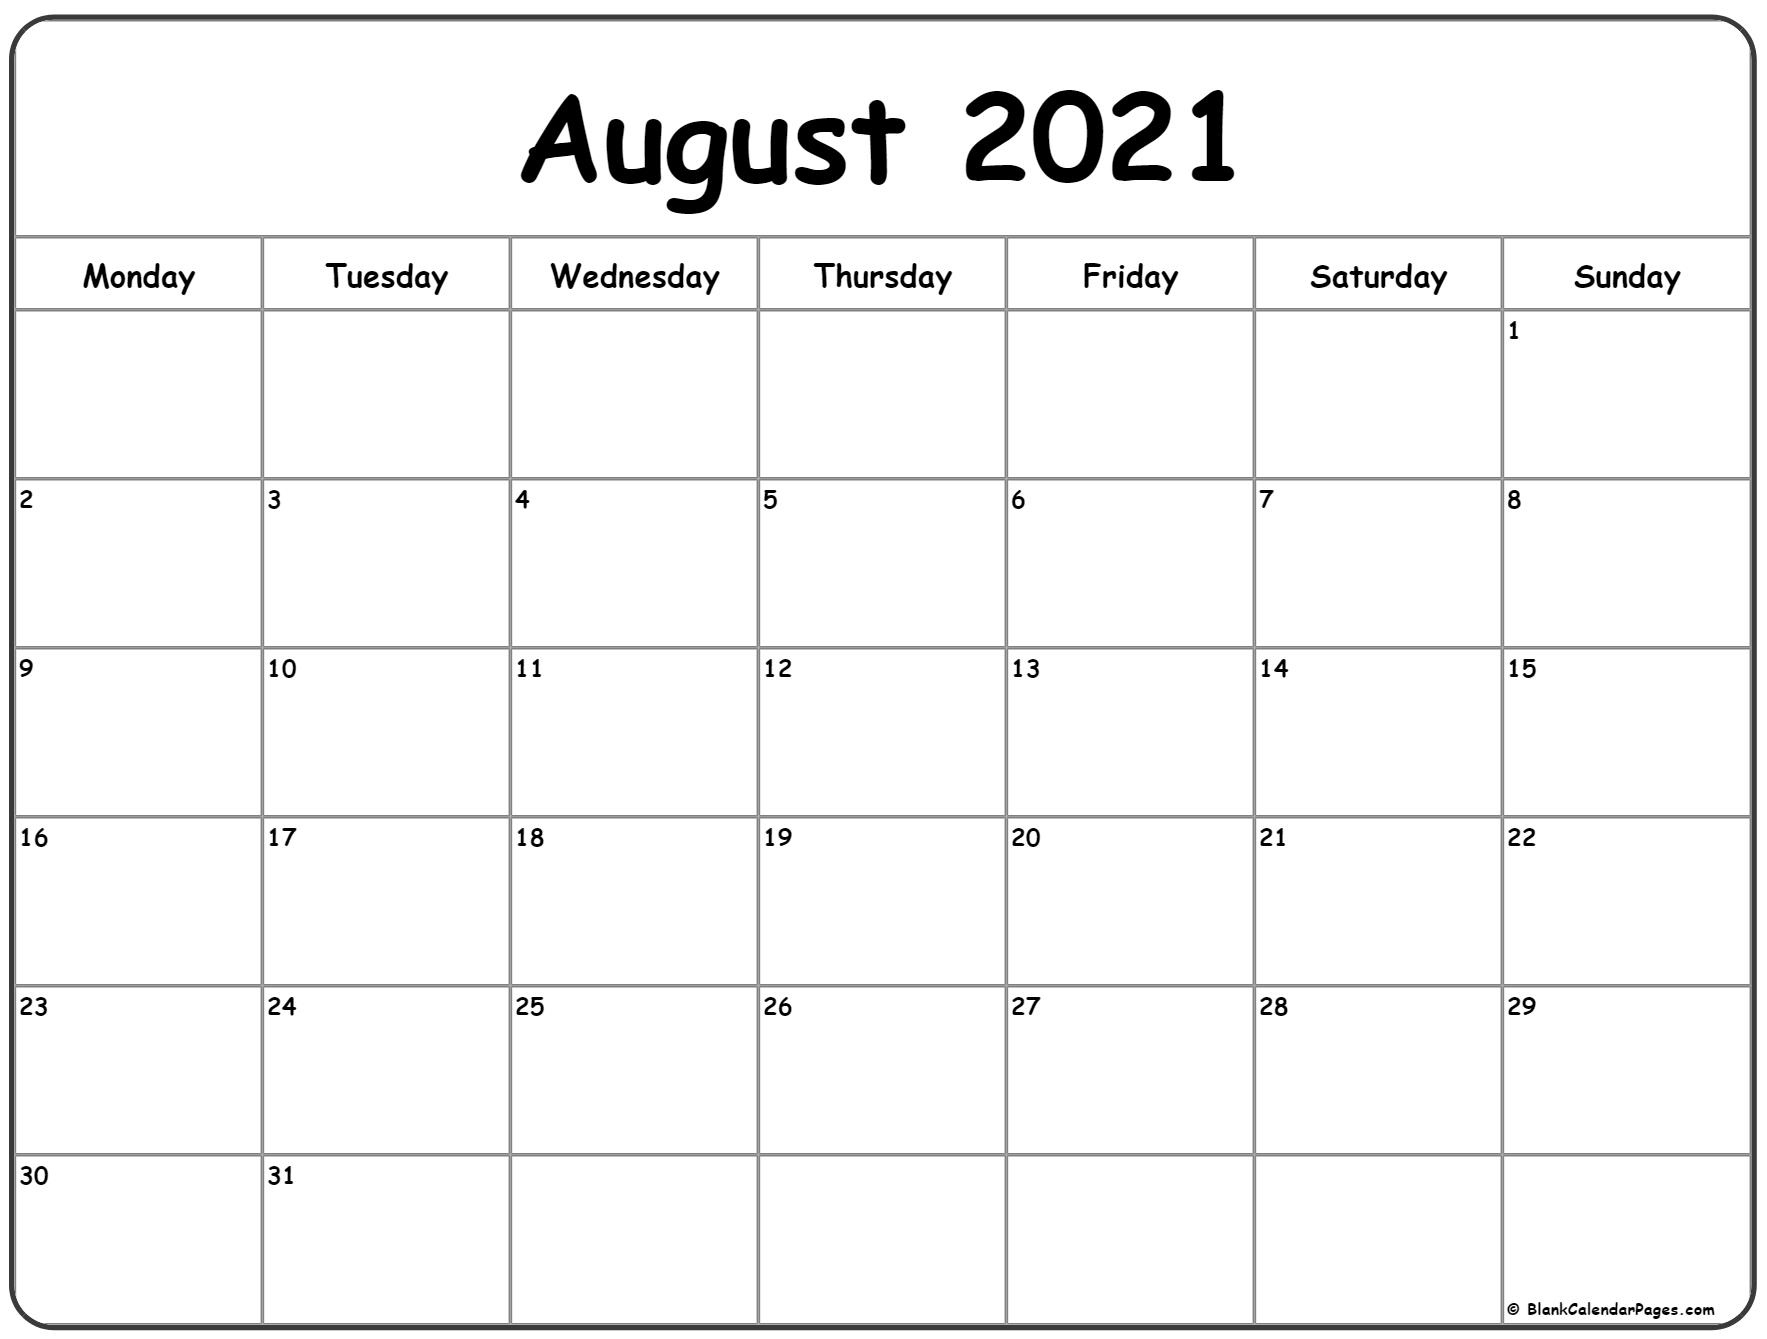 August 2021 Monday Calendar | Monday To Sunday August 2021 Calendar Print